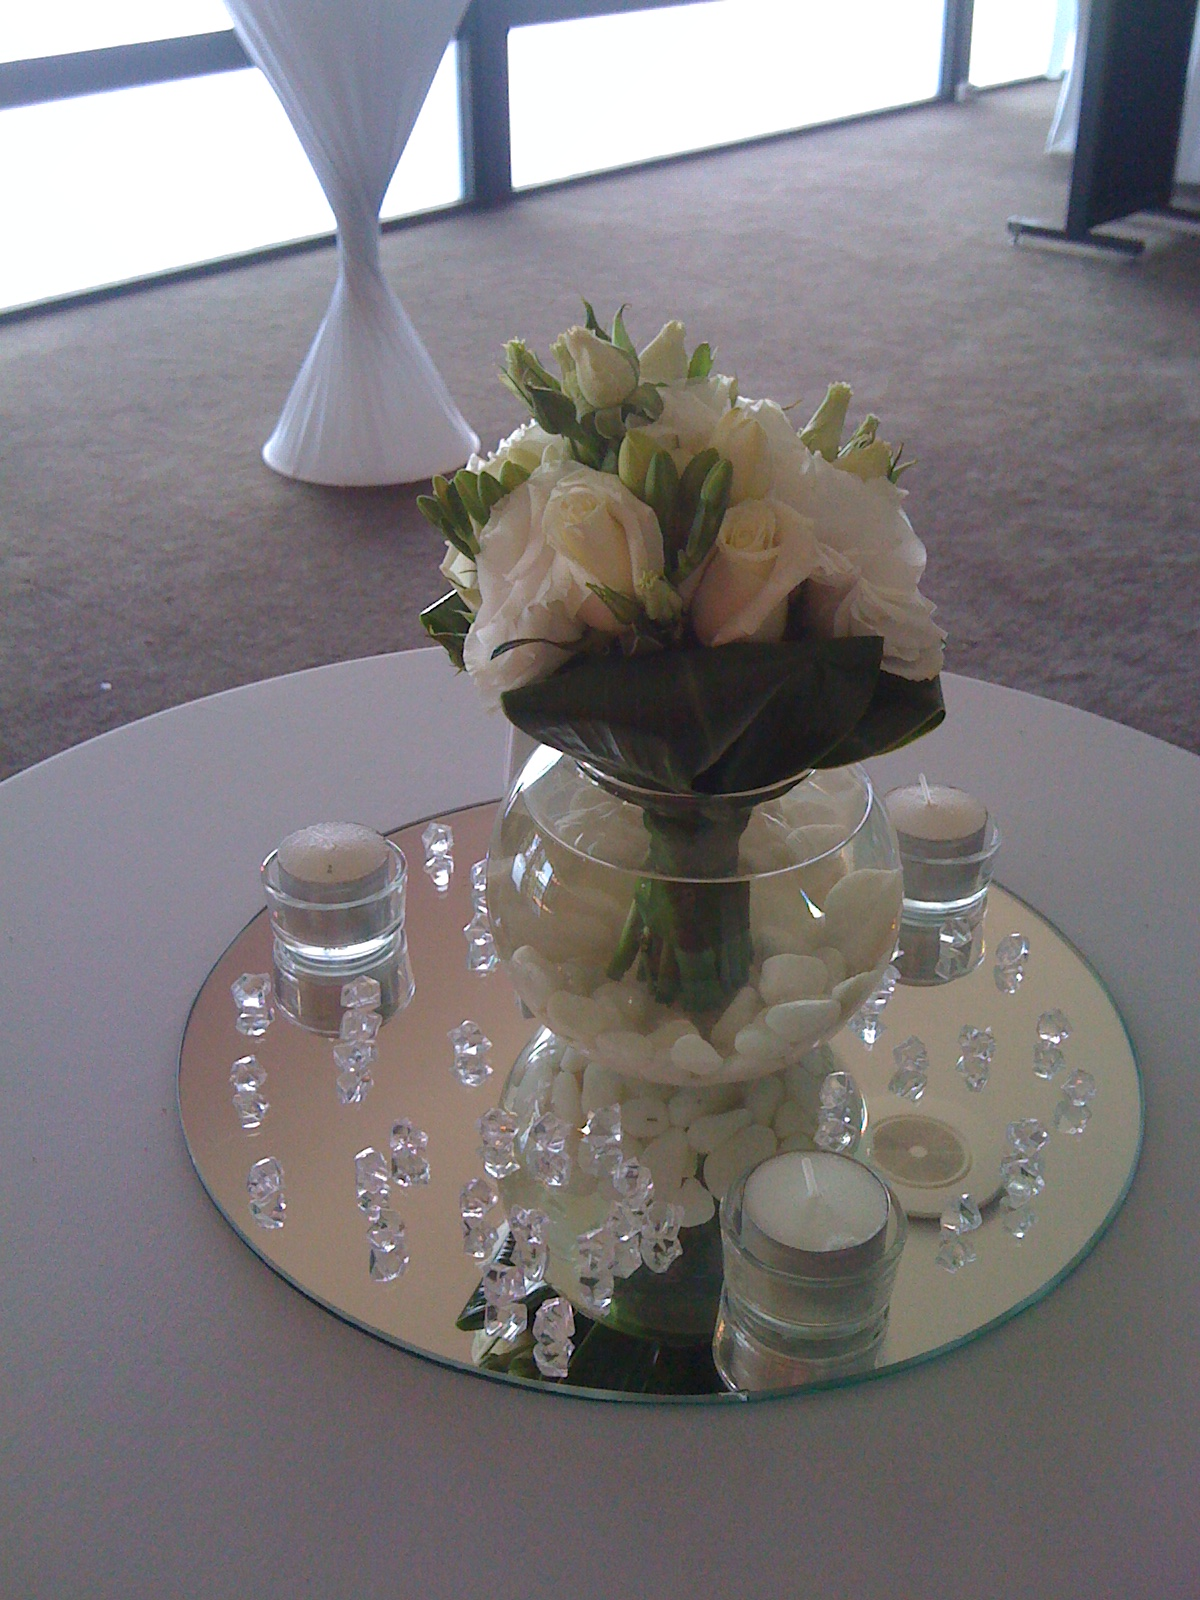 Cocktail flower decoration